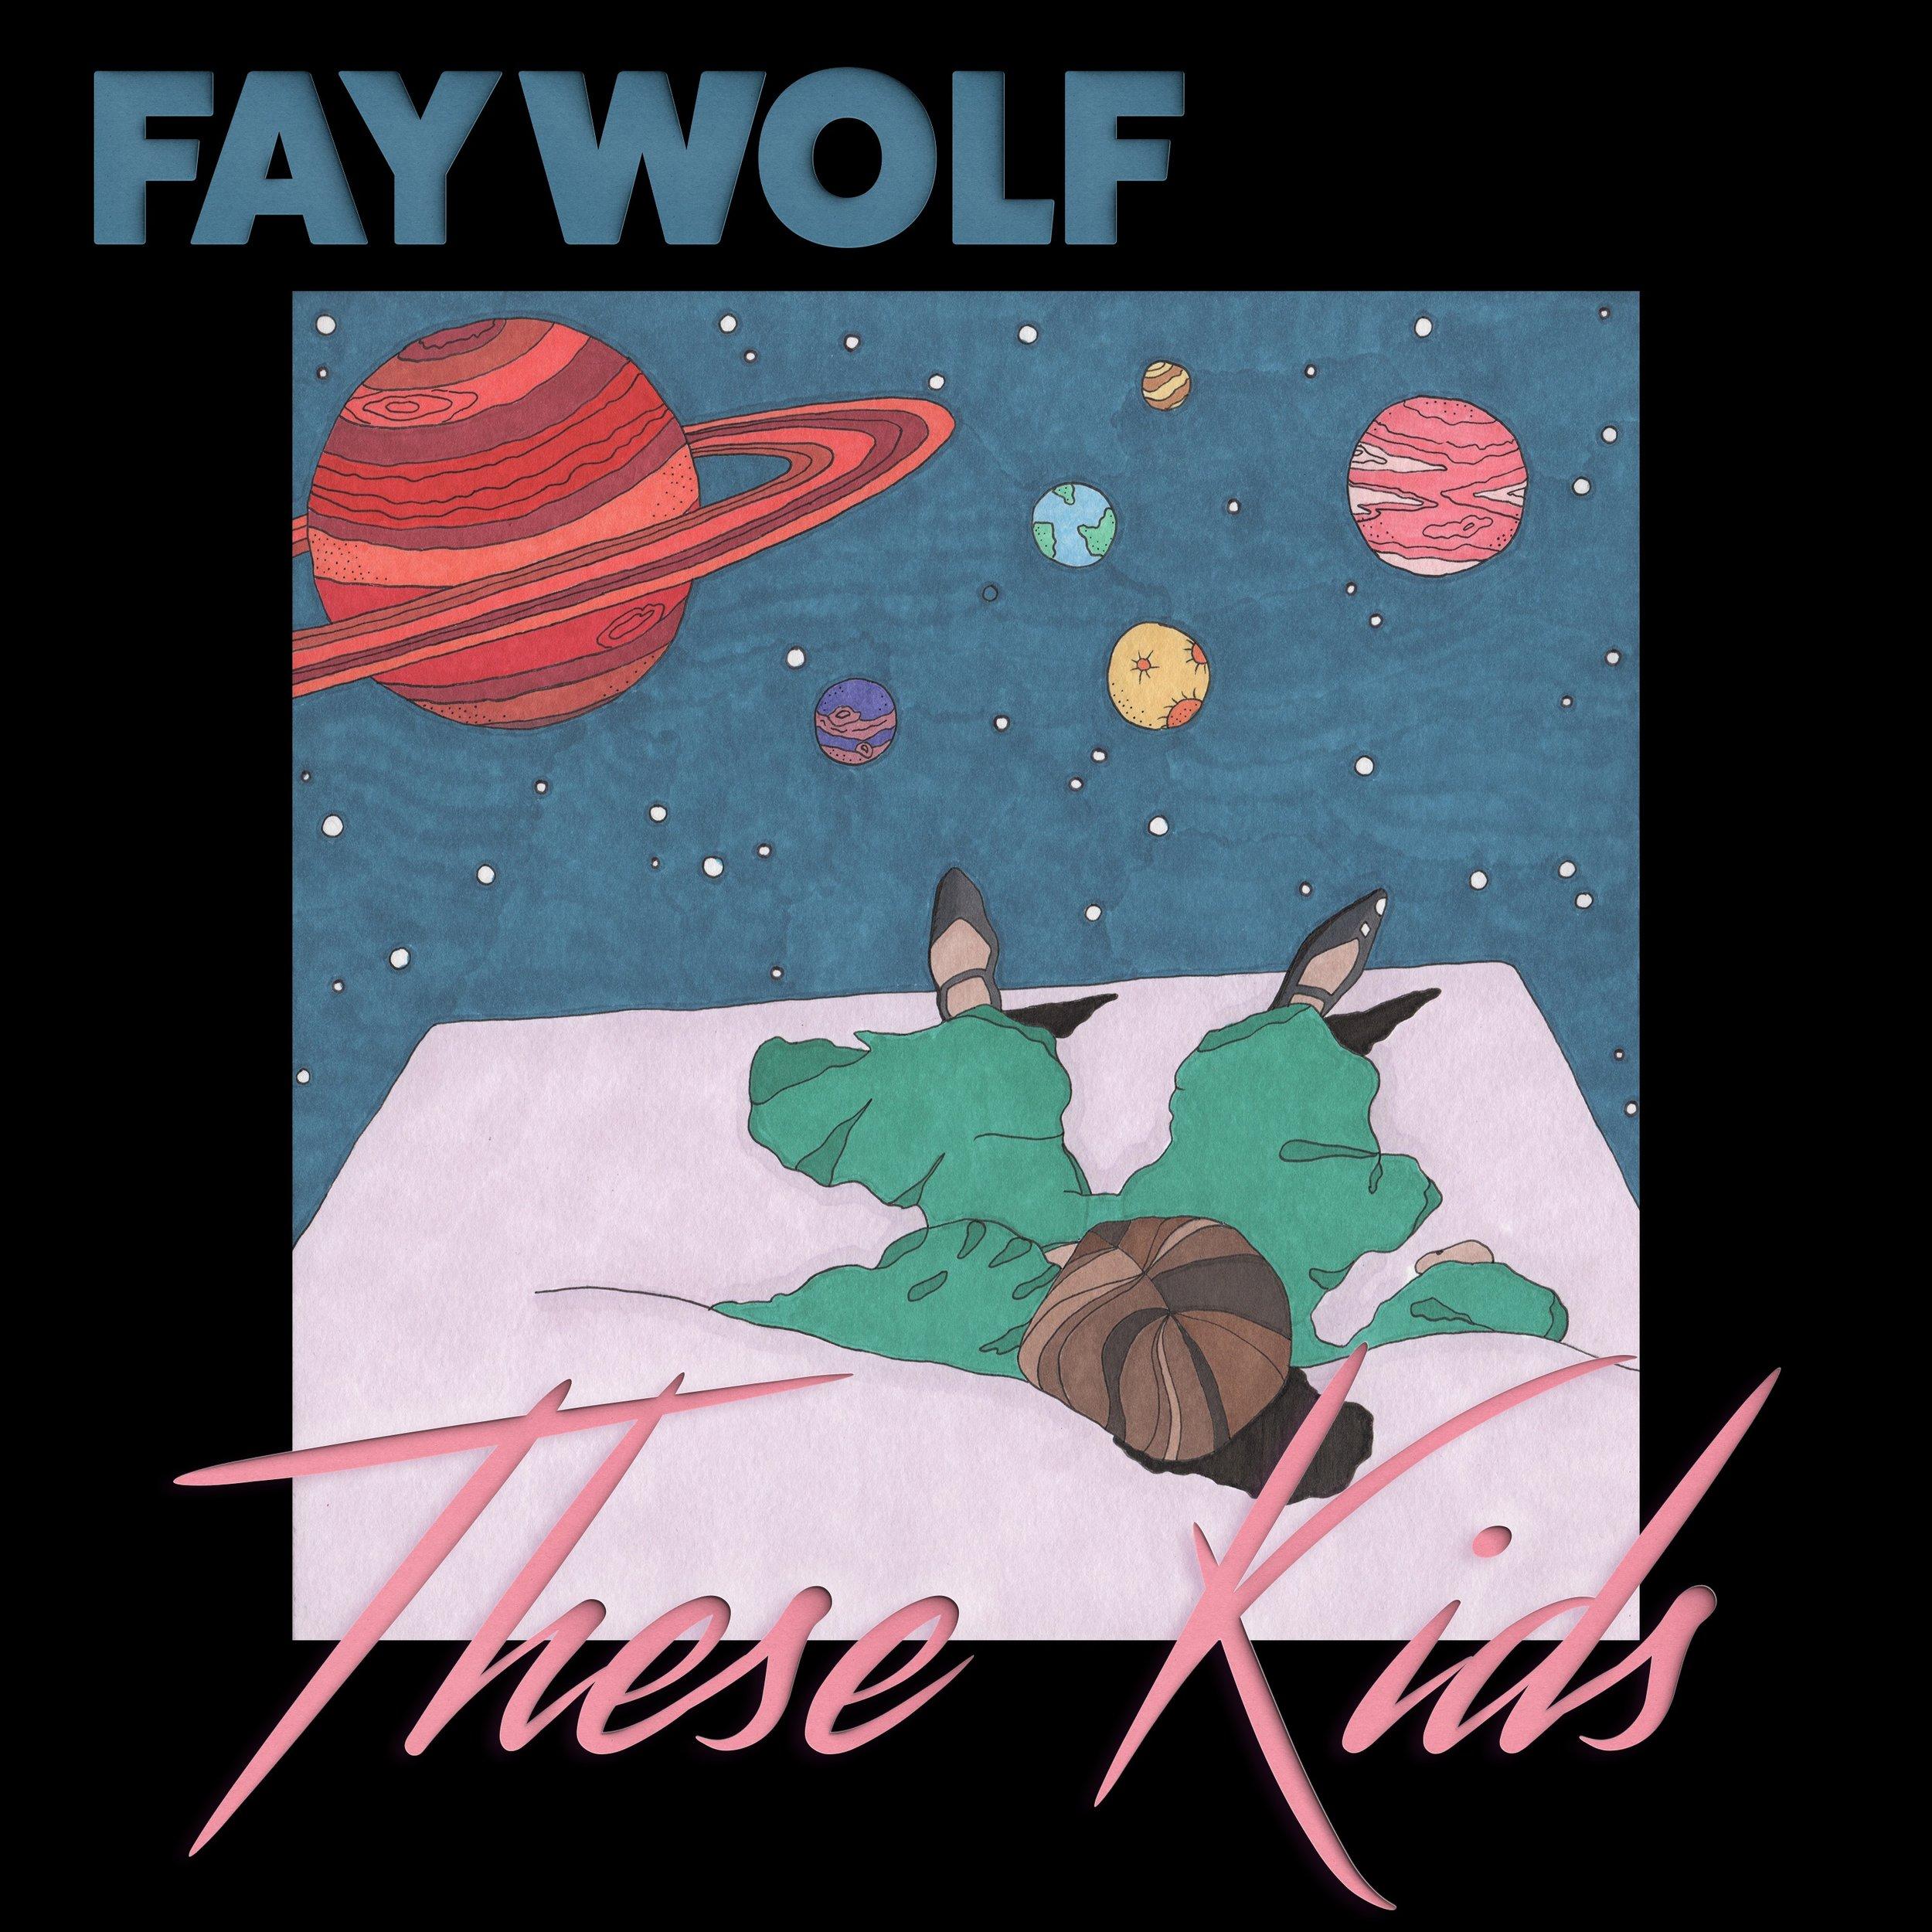 TheseKids-FayWolf-FinalAlbumCover.jpeg